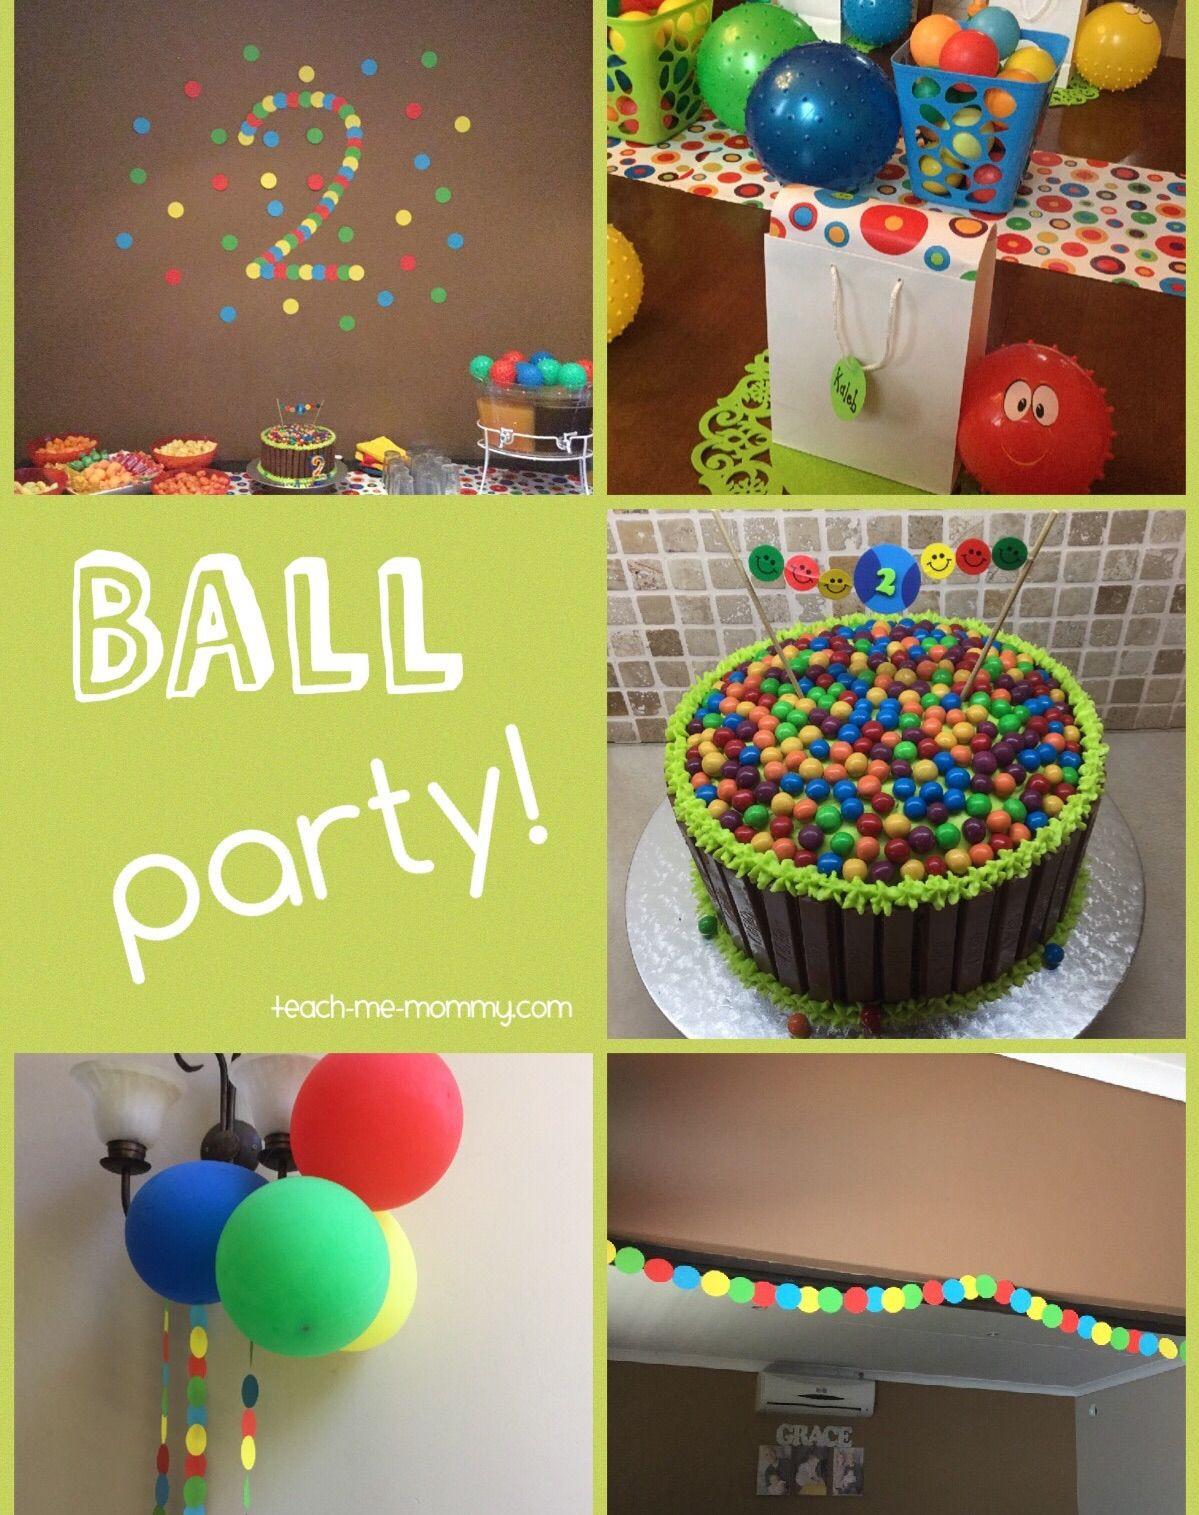 2 Year Old Boy Birthday Gifts  Pinterest